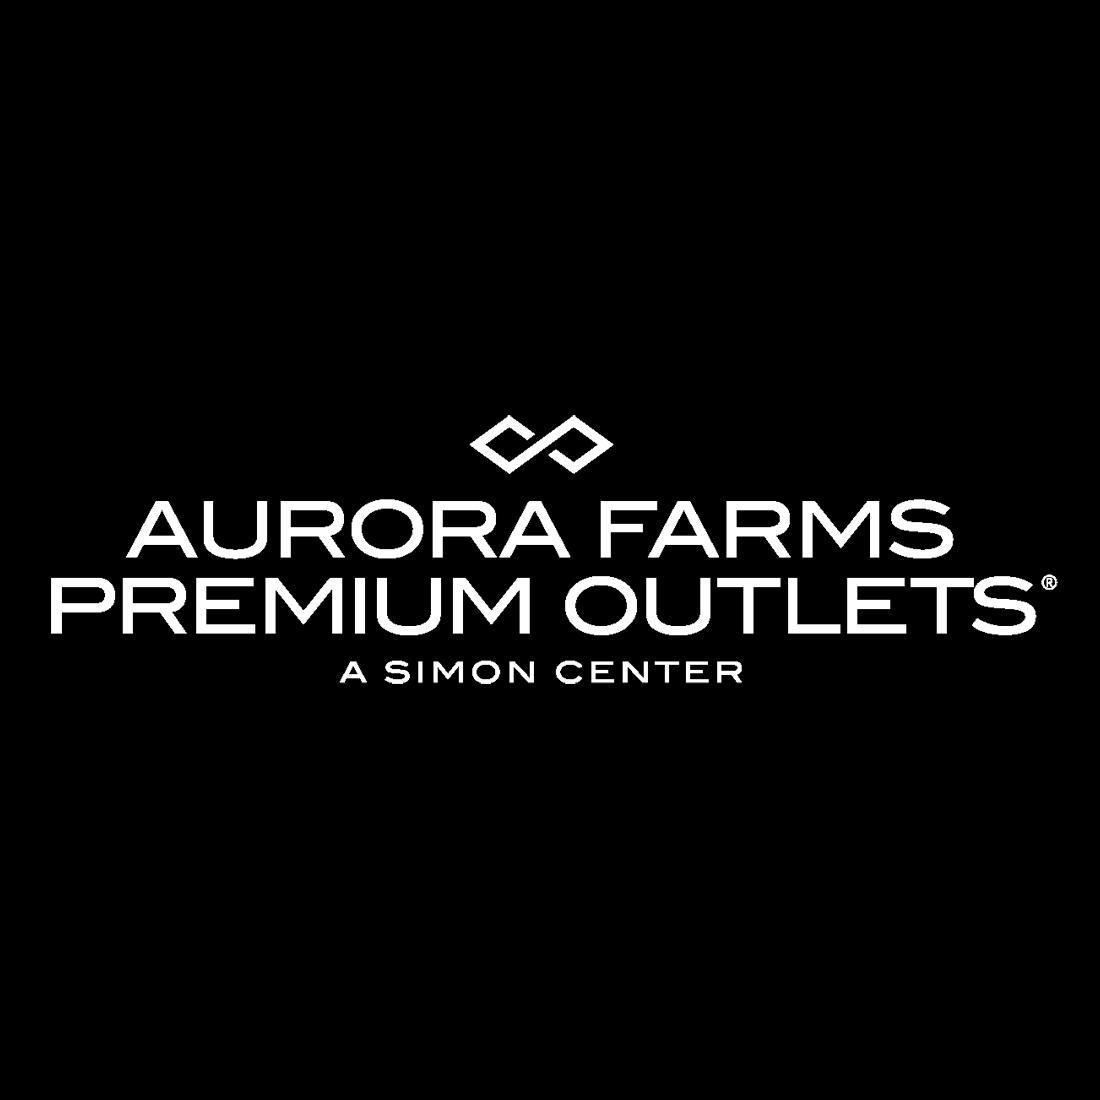 Aurora farms premium outlet coupons